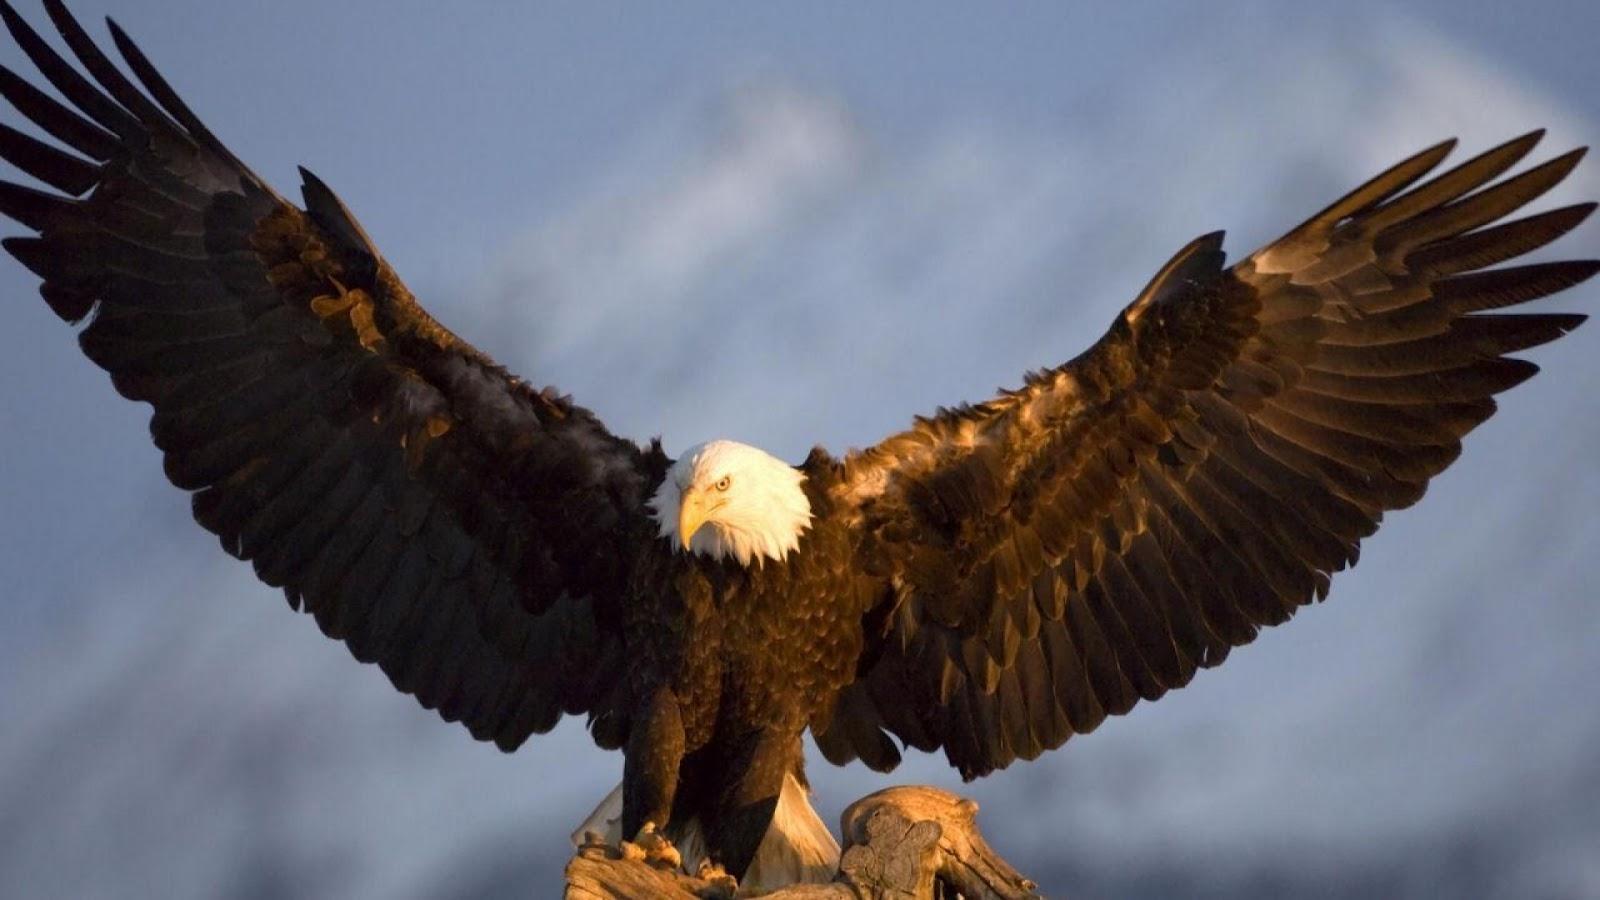 Beautiful Eagle Birds, Eagle, Eagle Wallpapers, Wallpapers Birds, Birds,عقاب, خلفيات نسر, صور نسر, نسر, خلفيات طيور,